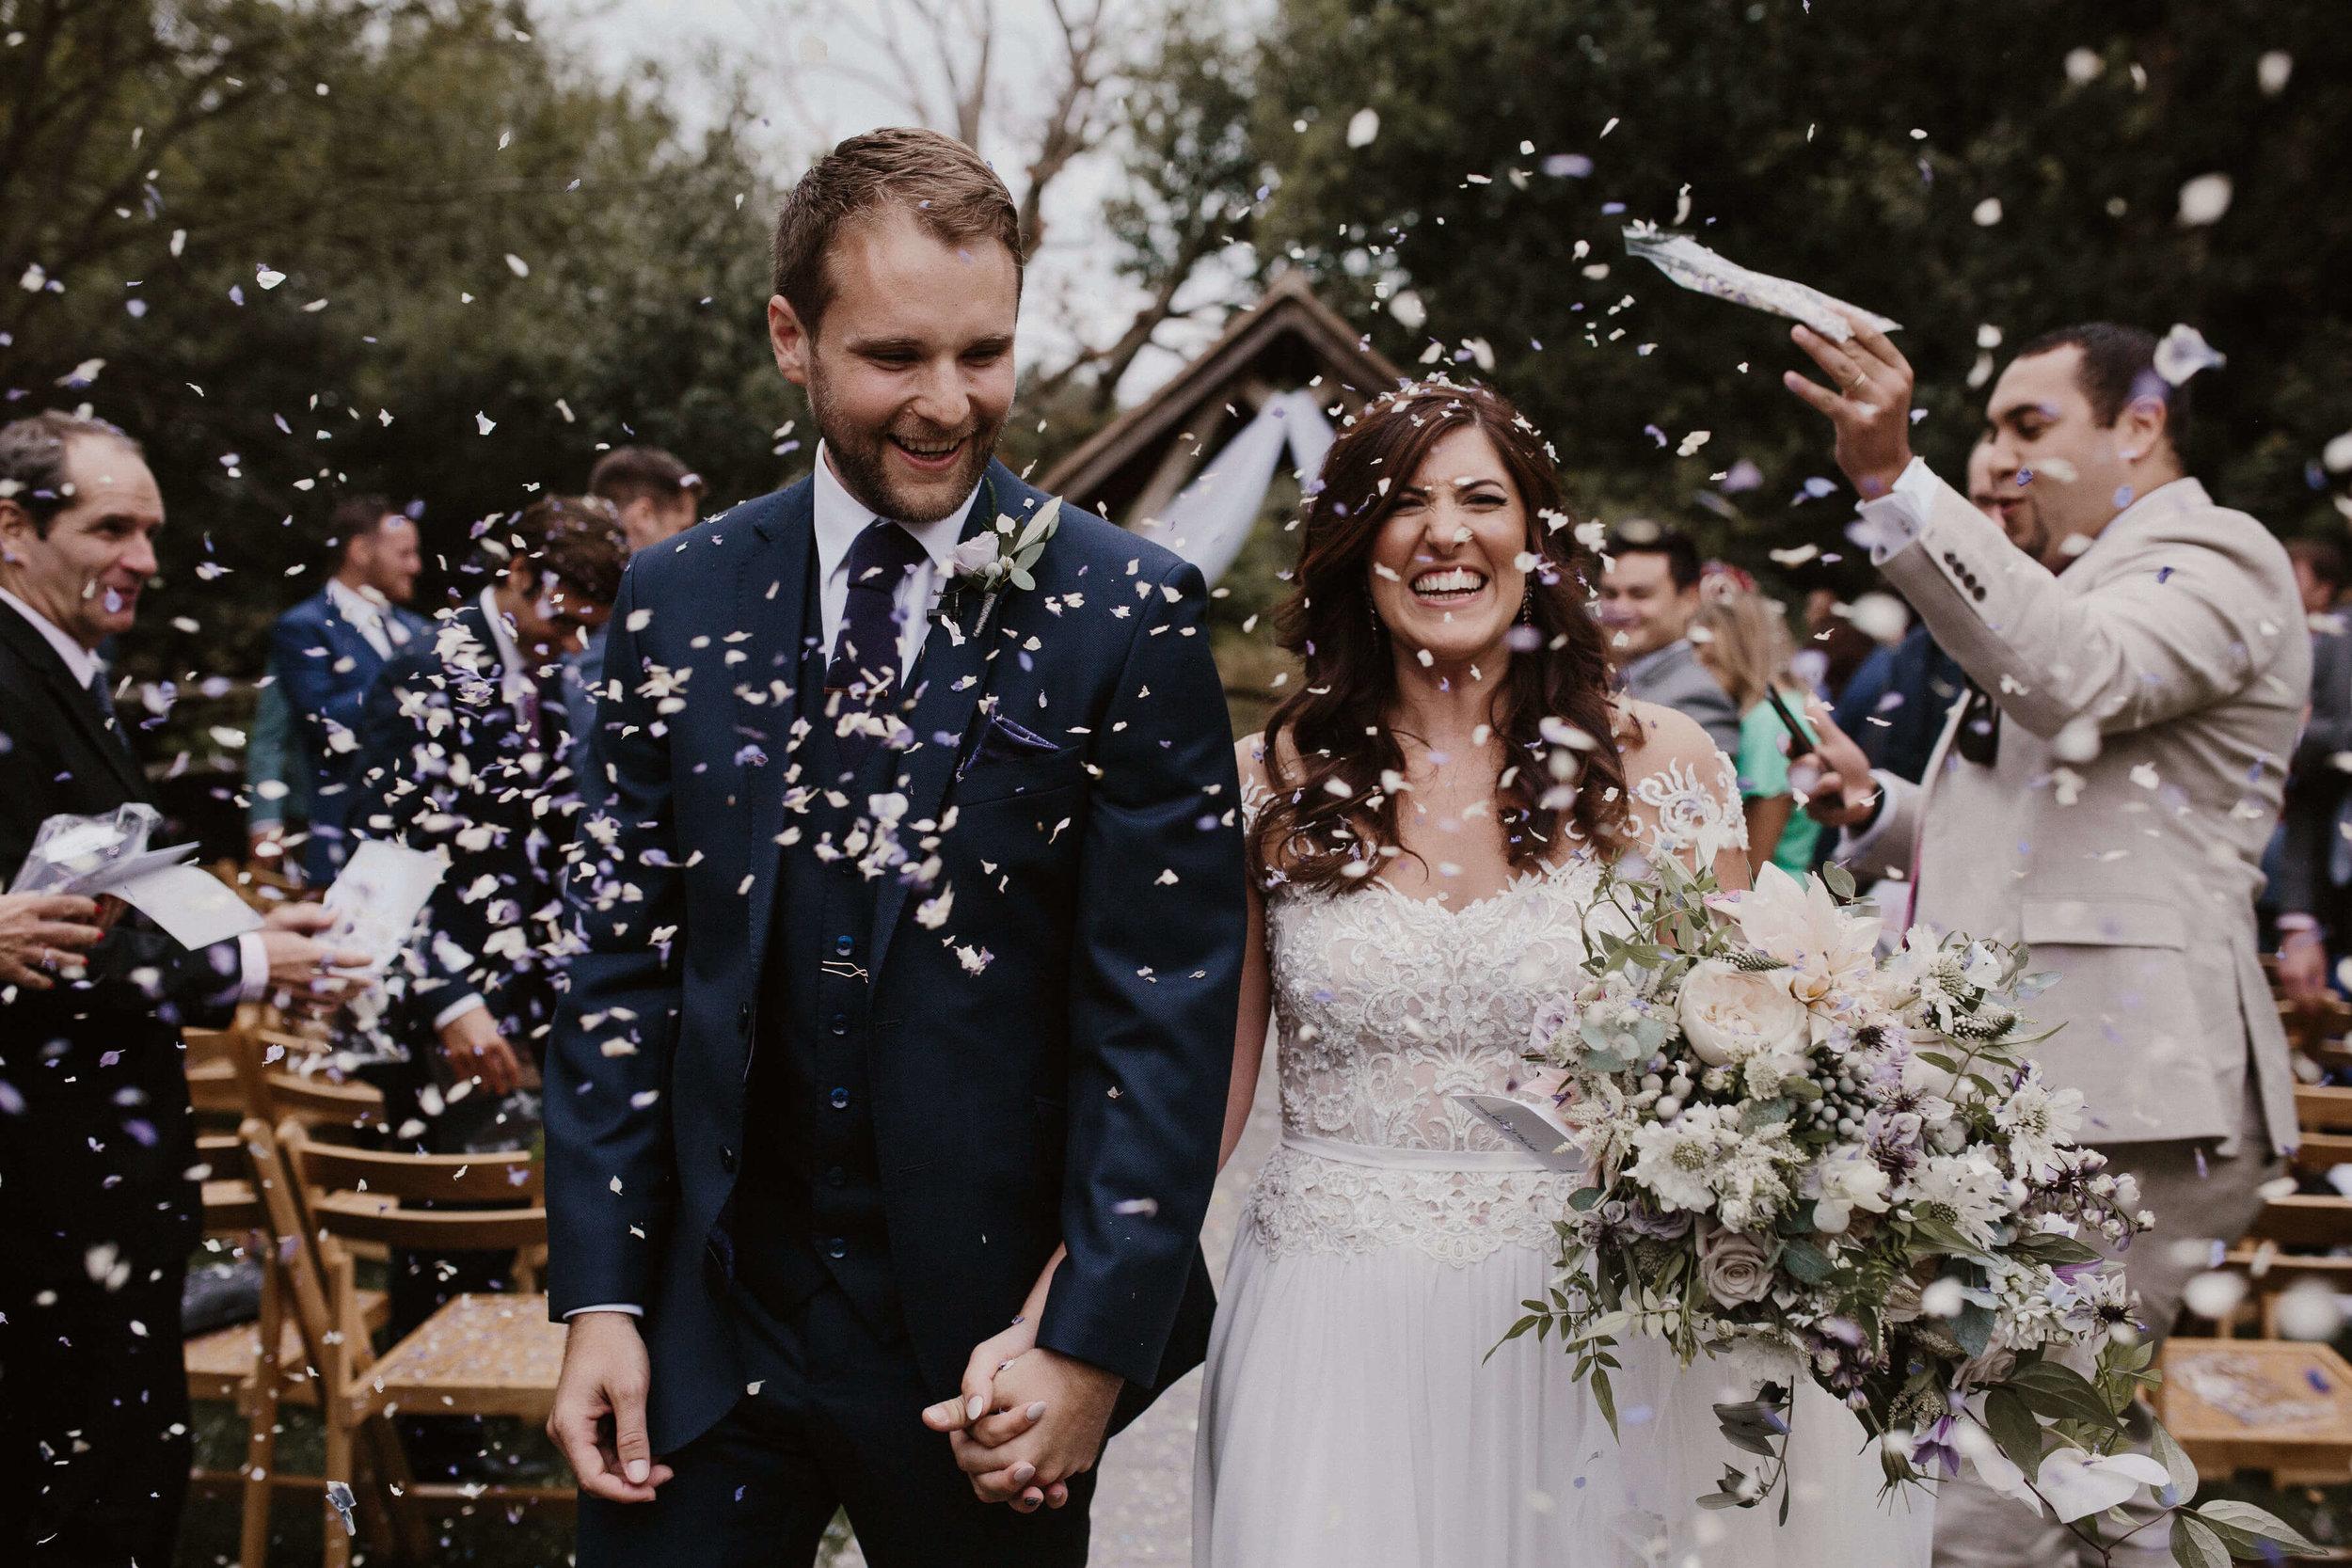 Nat and Tom - 05 - Ceremony - Sara Lincoln Photography-121.jpg